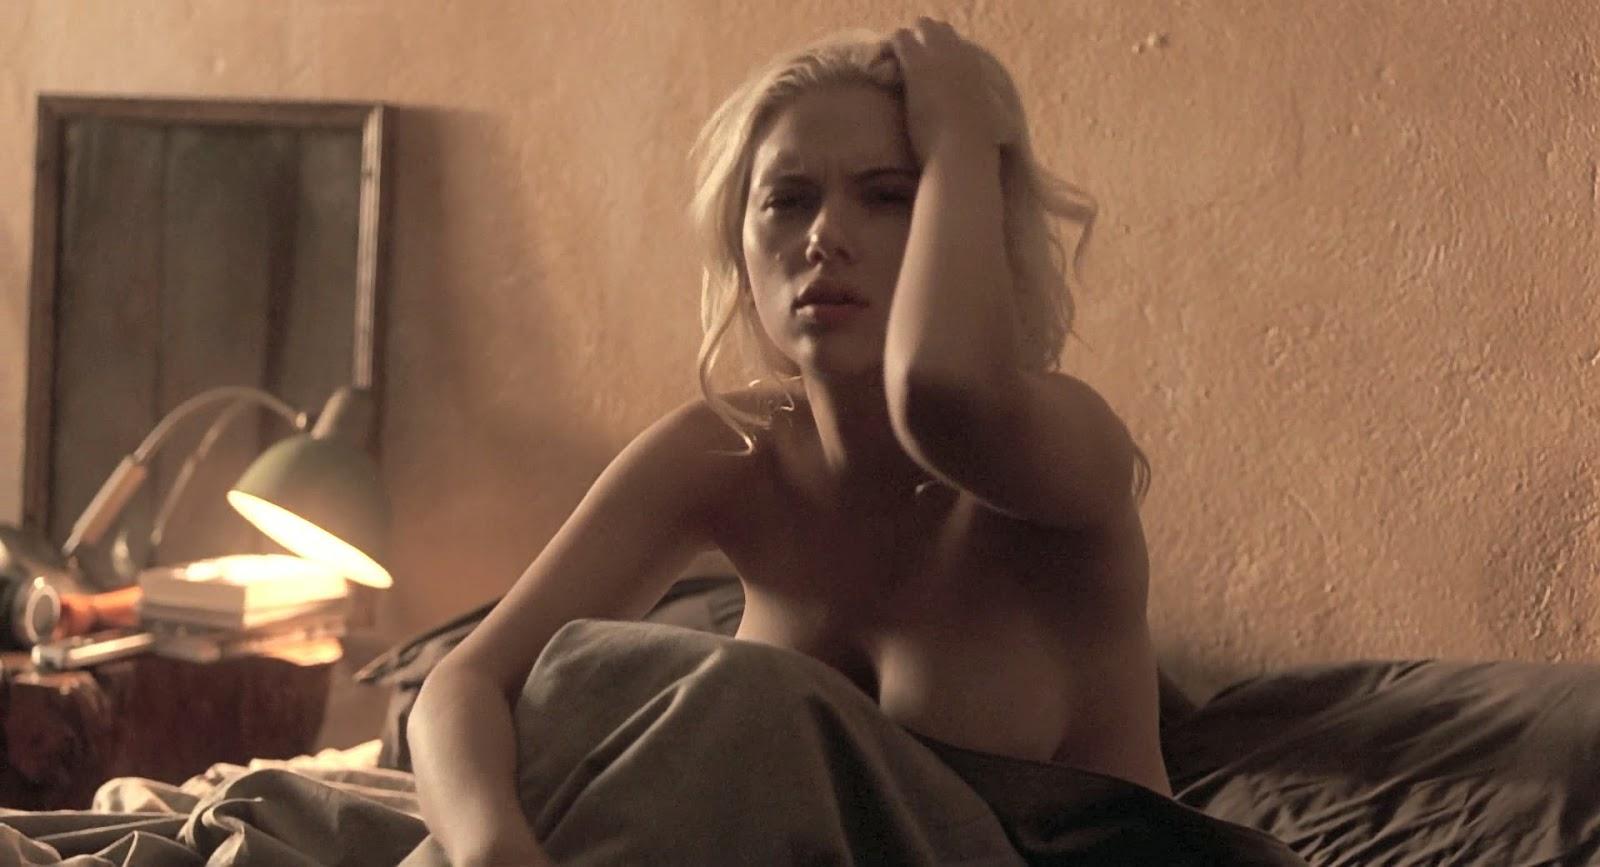 Porn sex girls pussy